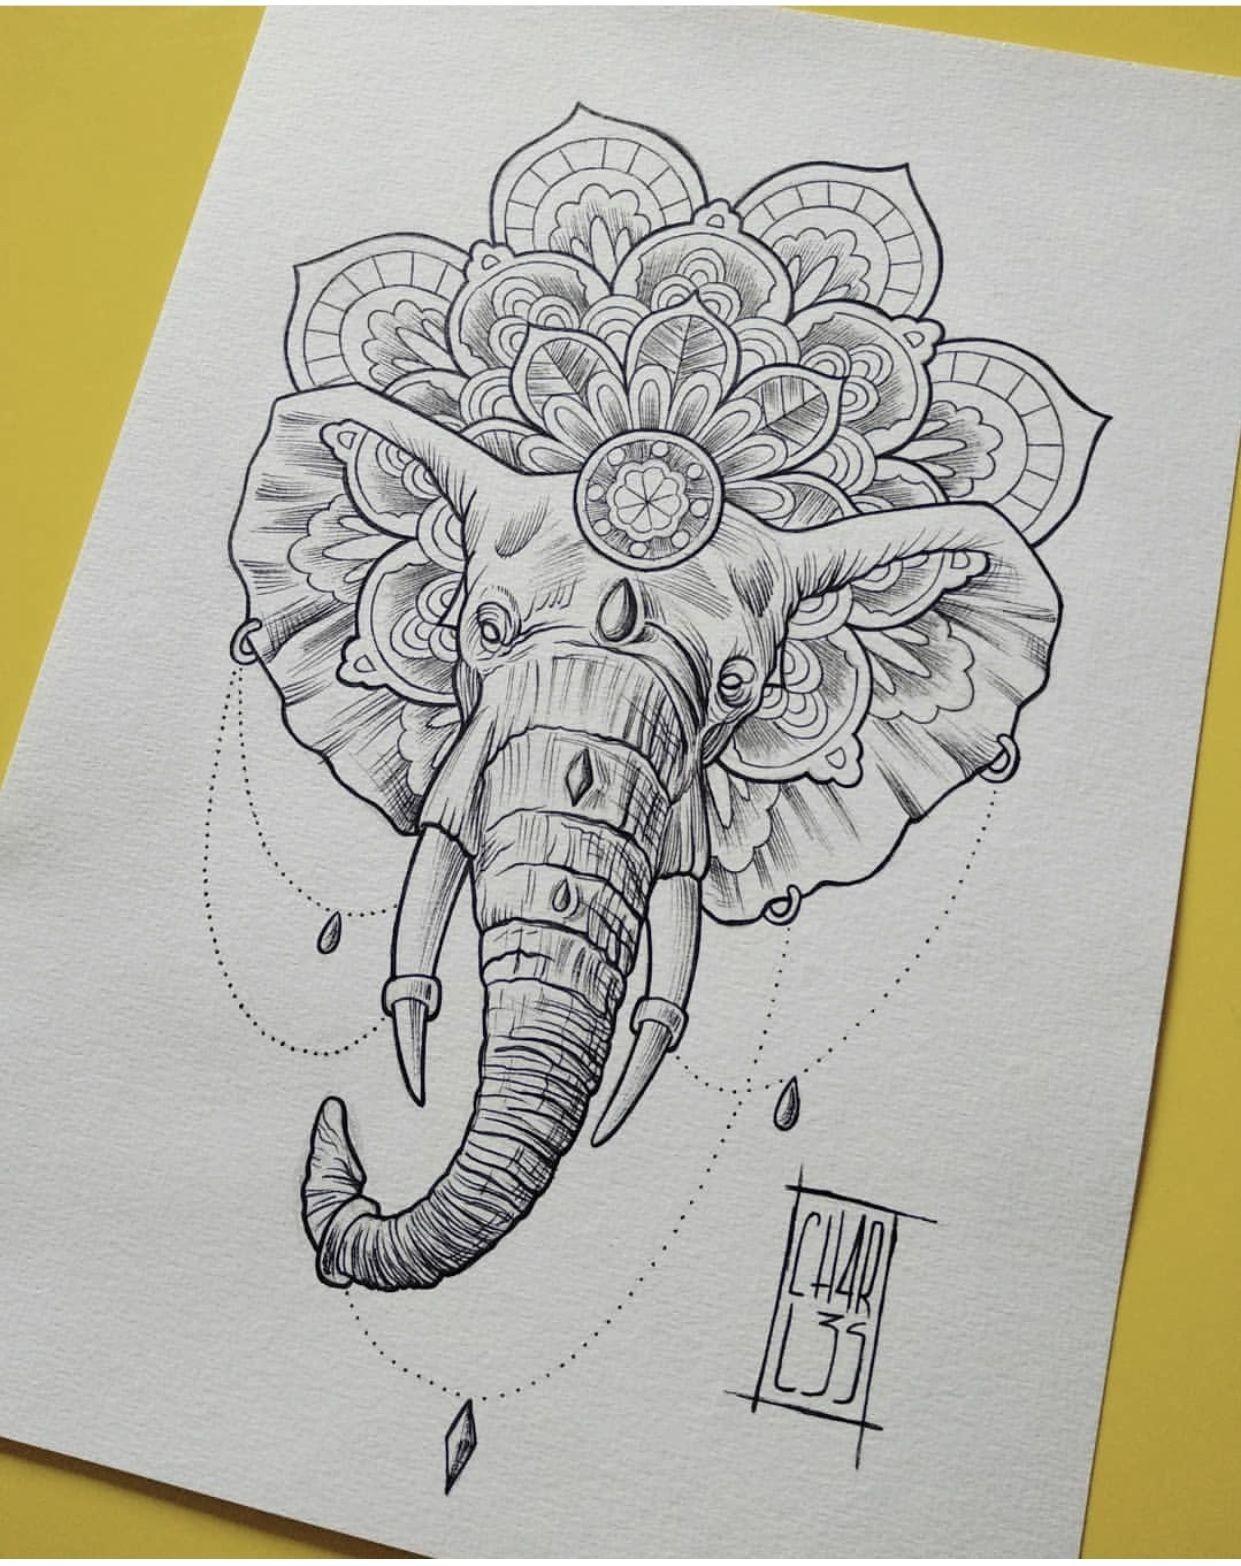 Neu Dessin Elephant Mandala Farbung Malvorlagen Malvorlagenkostenlos Mandala Elephant Tattoo Geometric Elephant Tattoo Elephant Tattoos